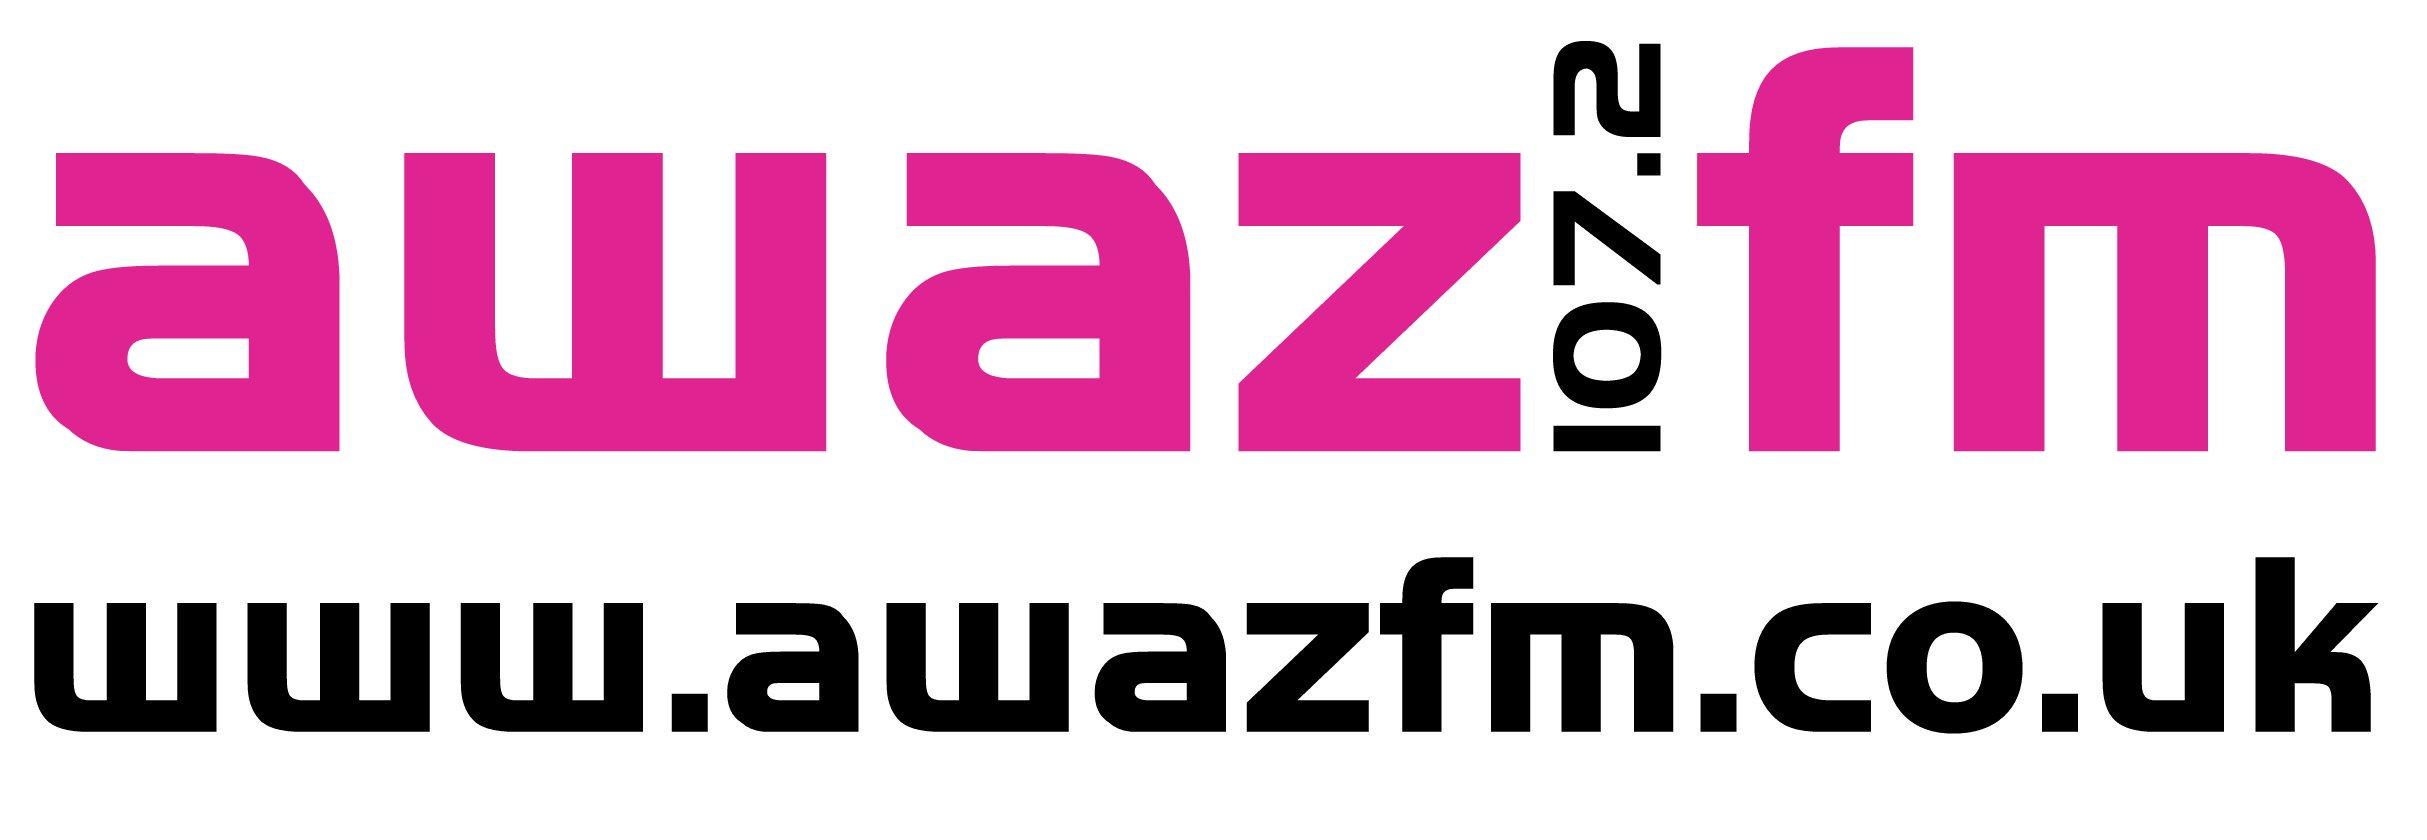 Exaget News – New Partner Awaz FM